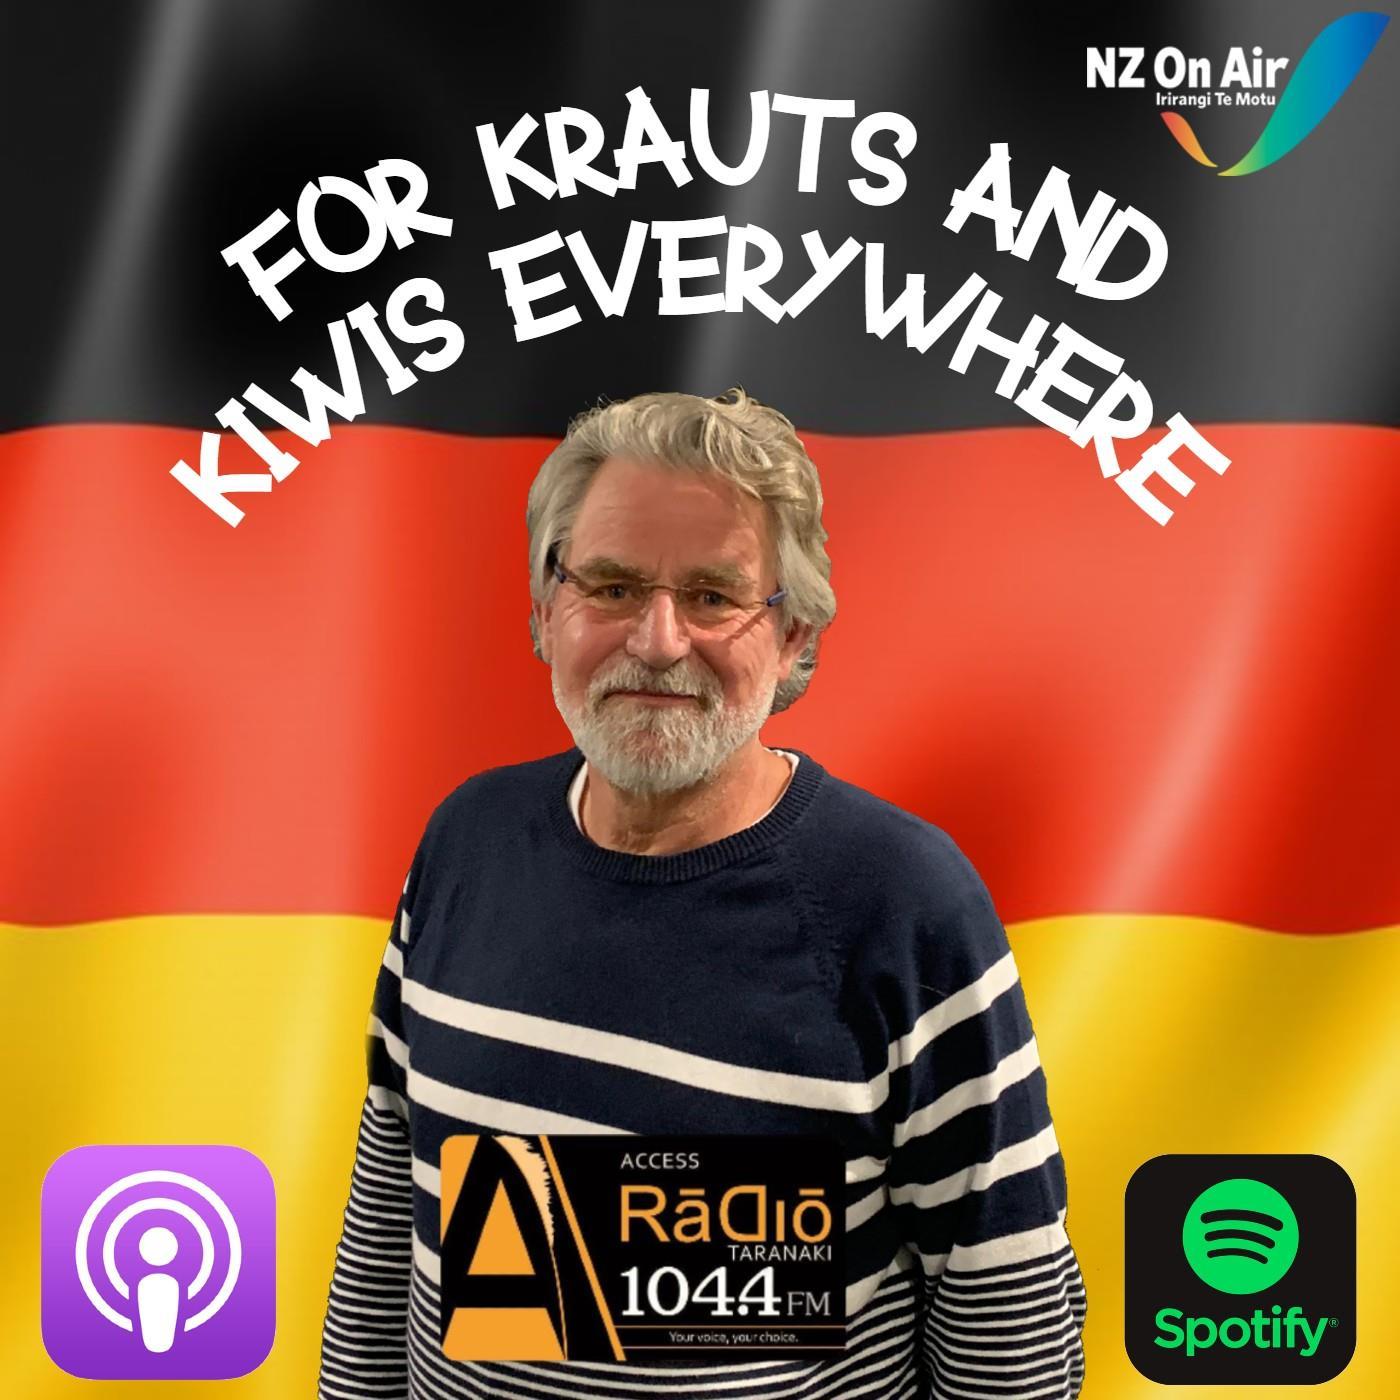 For Krauts and Kiwis Everywhere